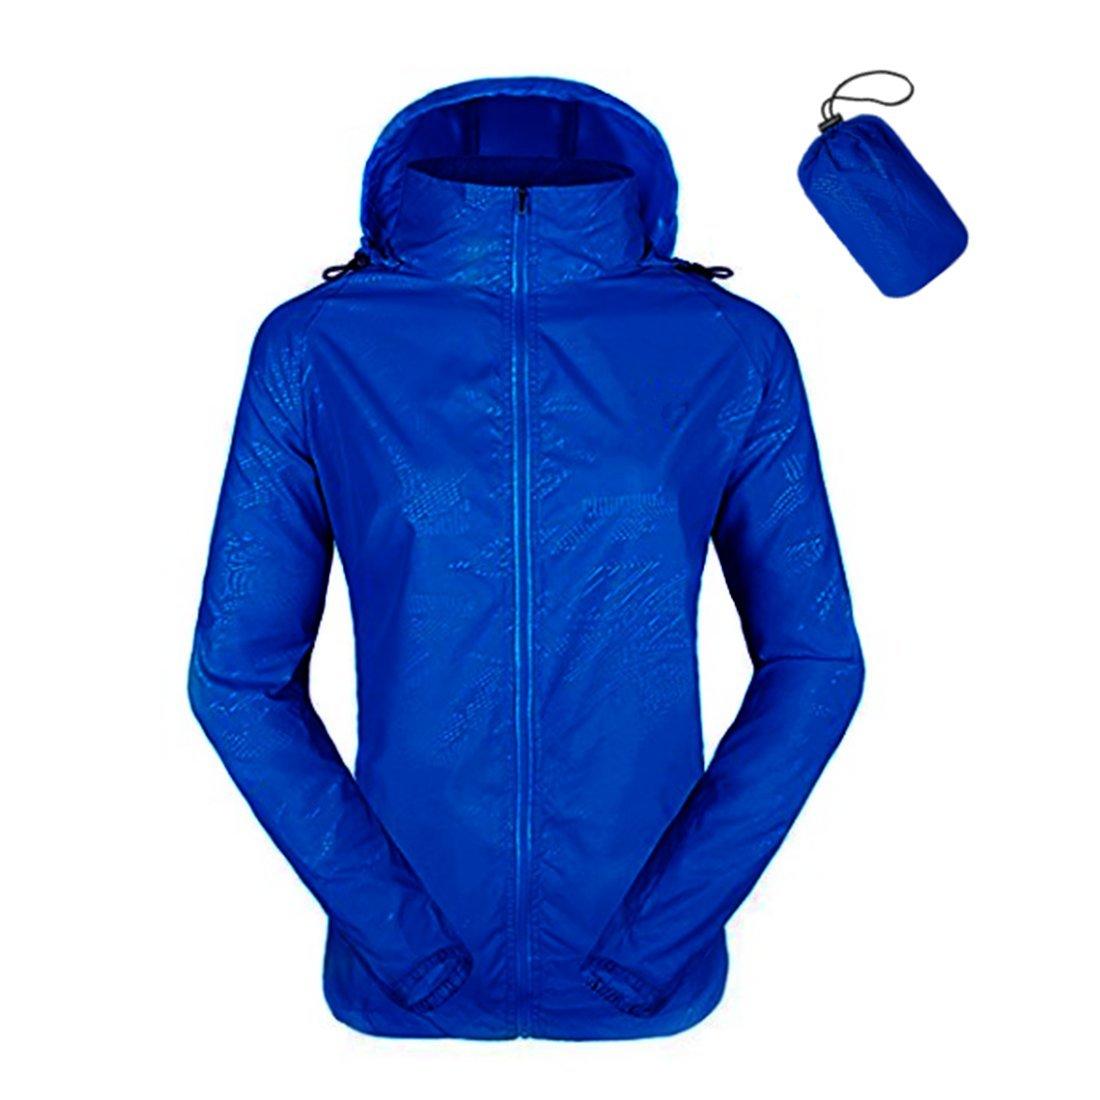 ZIMCA Unisex Packable Lightweight UV Protect Jackets Outdoor Windbreaker Quick-Dry Skin Rain Coat (Women M/Men S, Royal Blue)